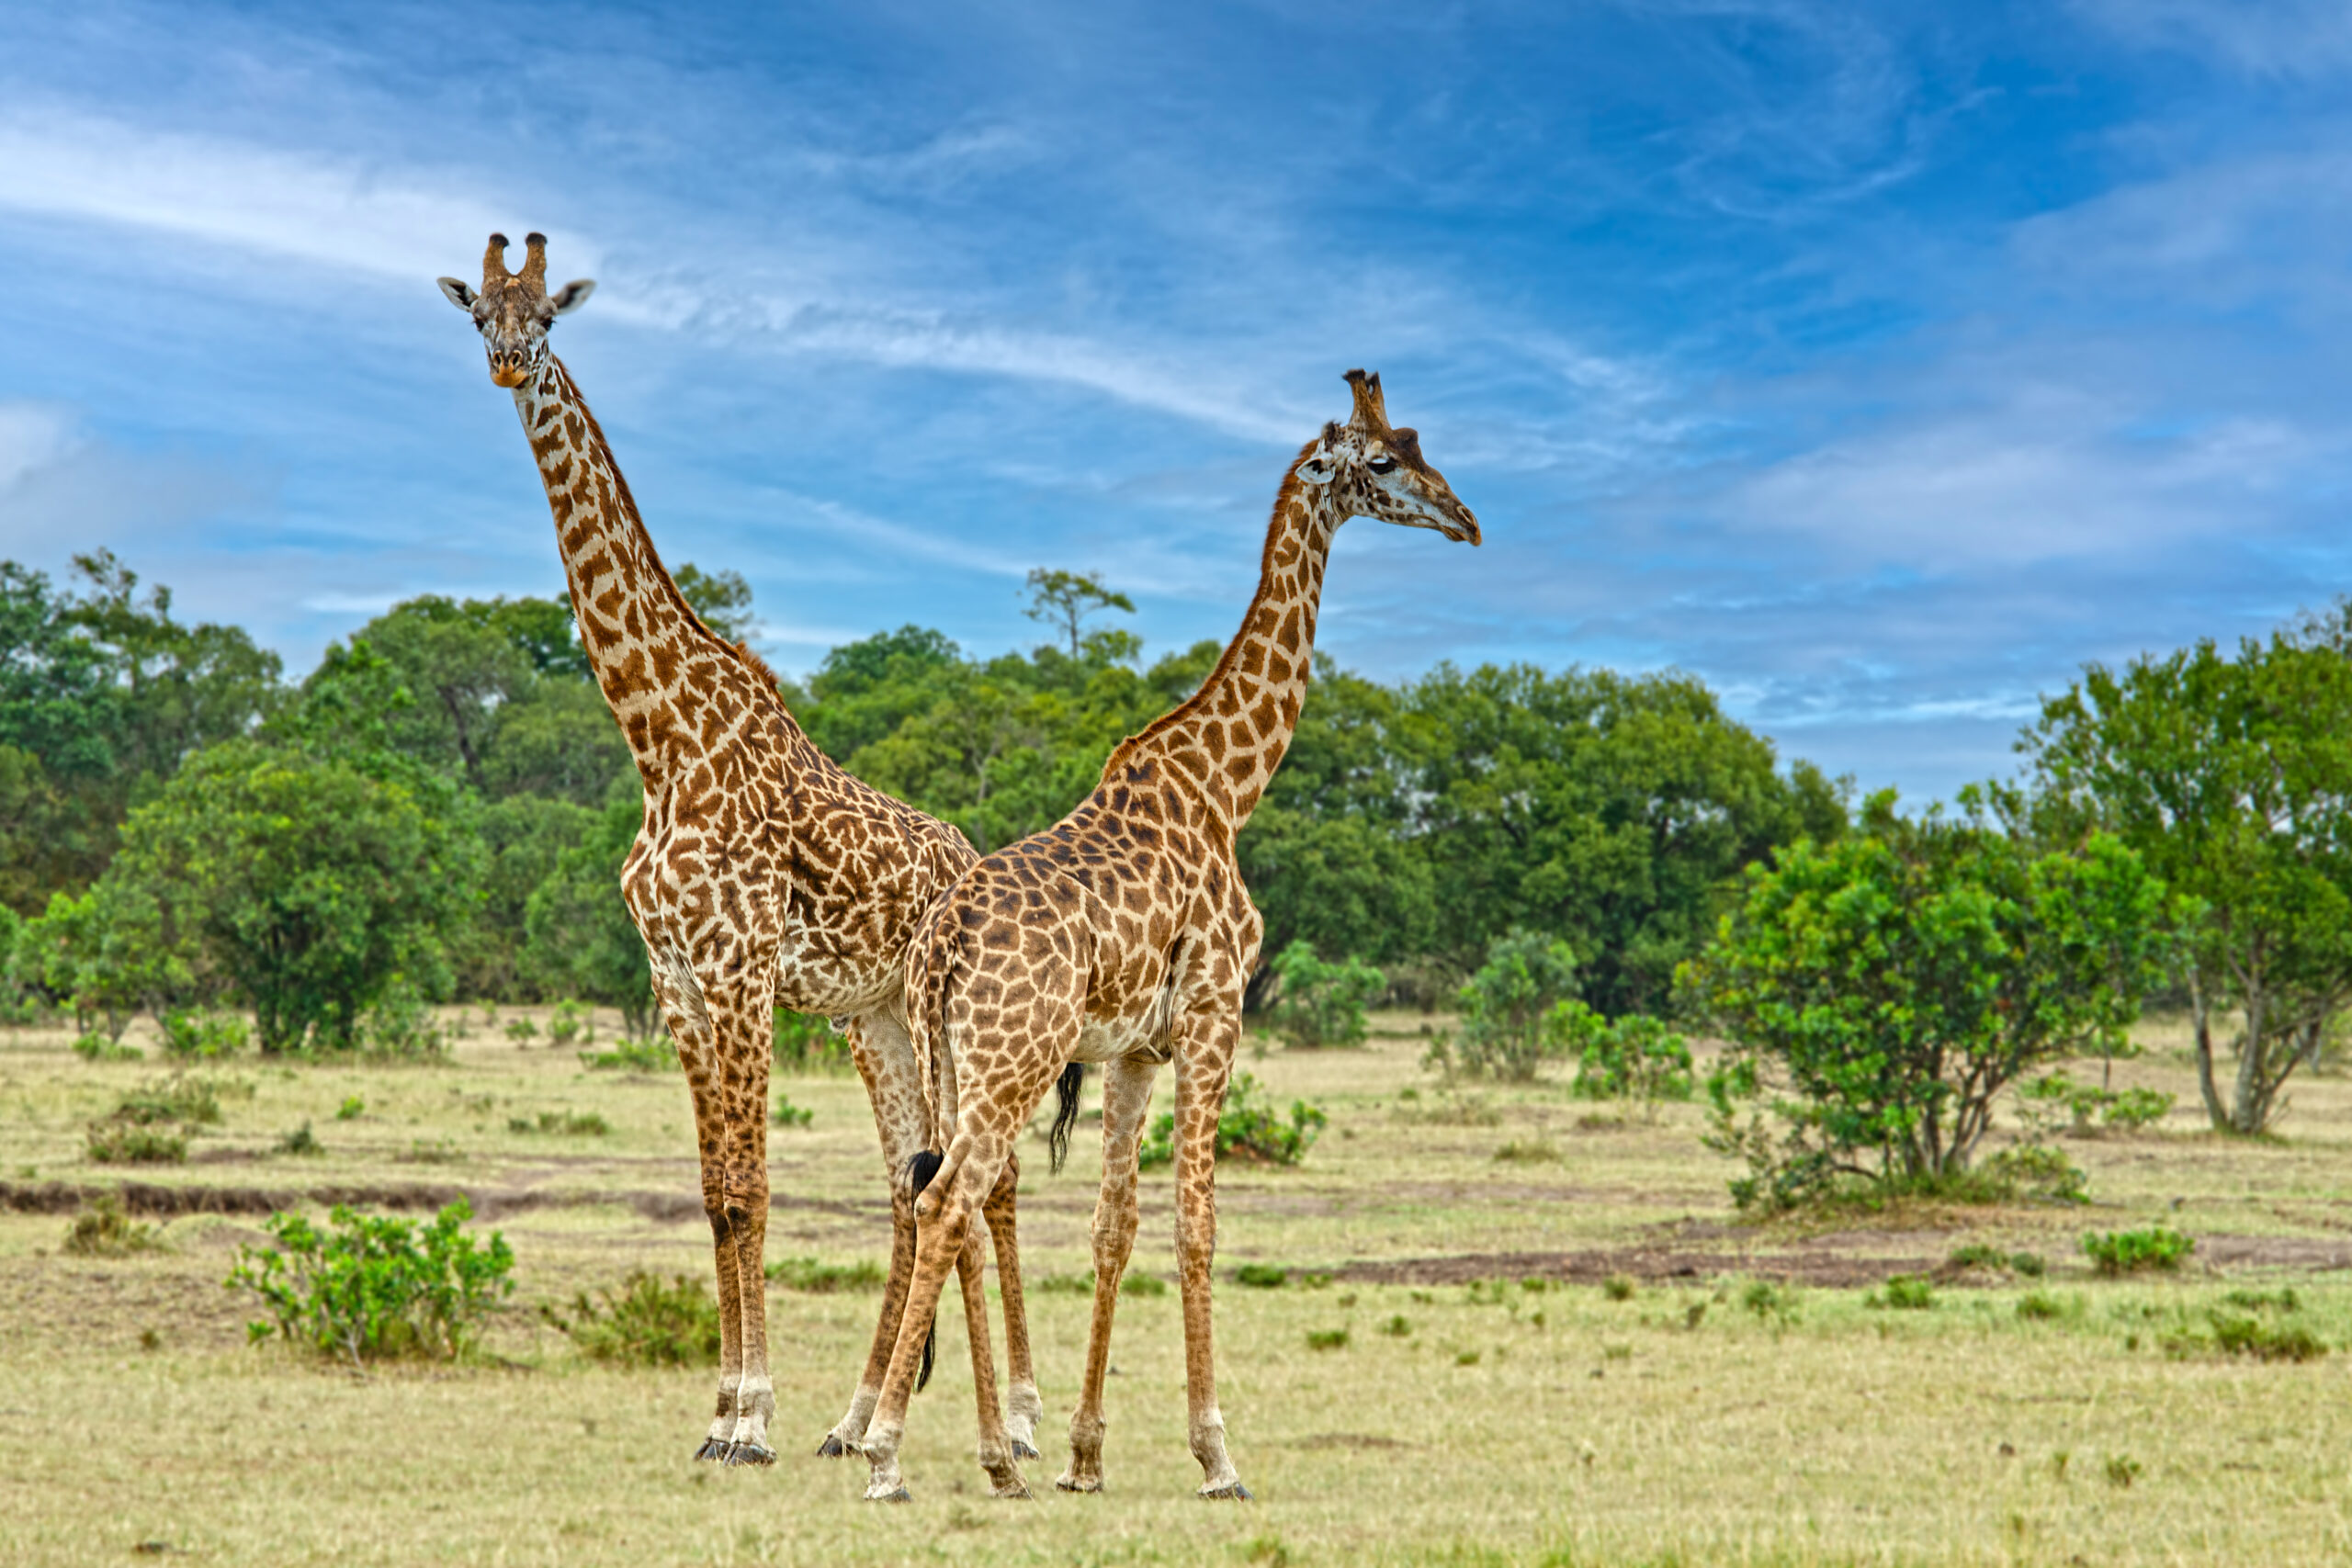 Giraffes in the Mara, August 2019